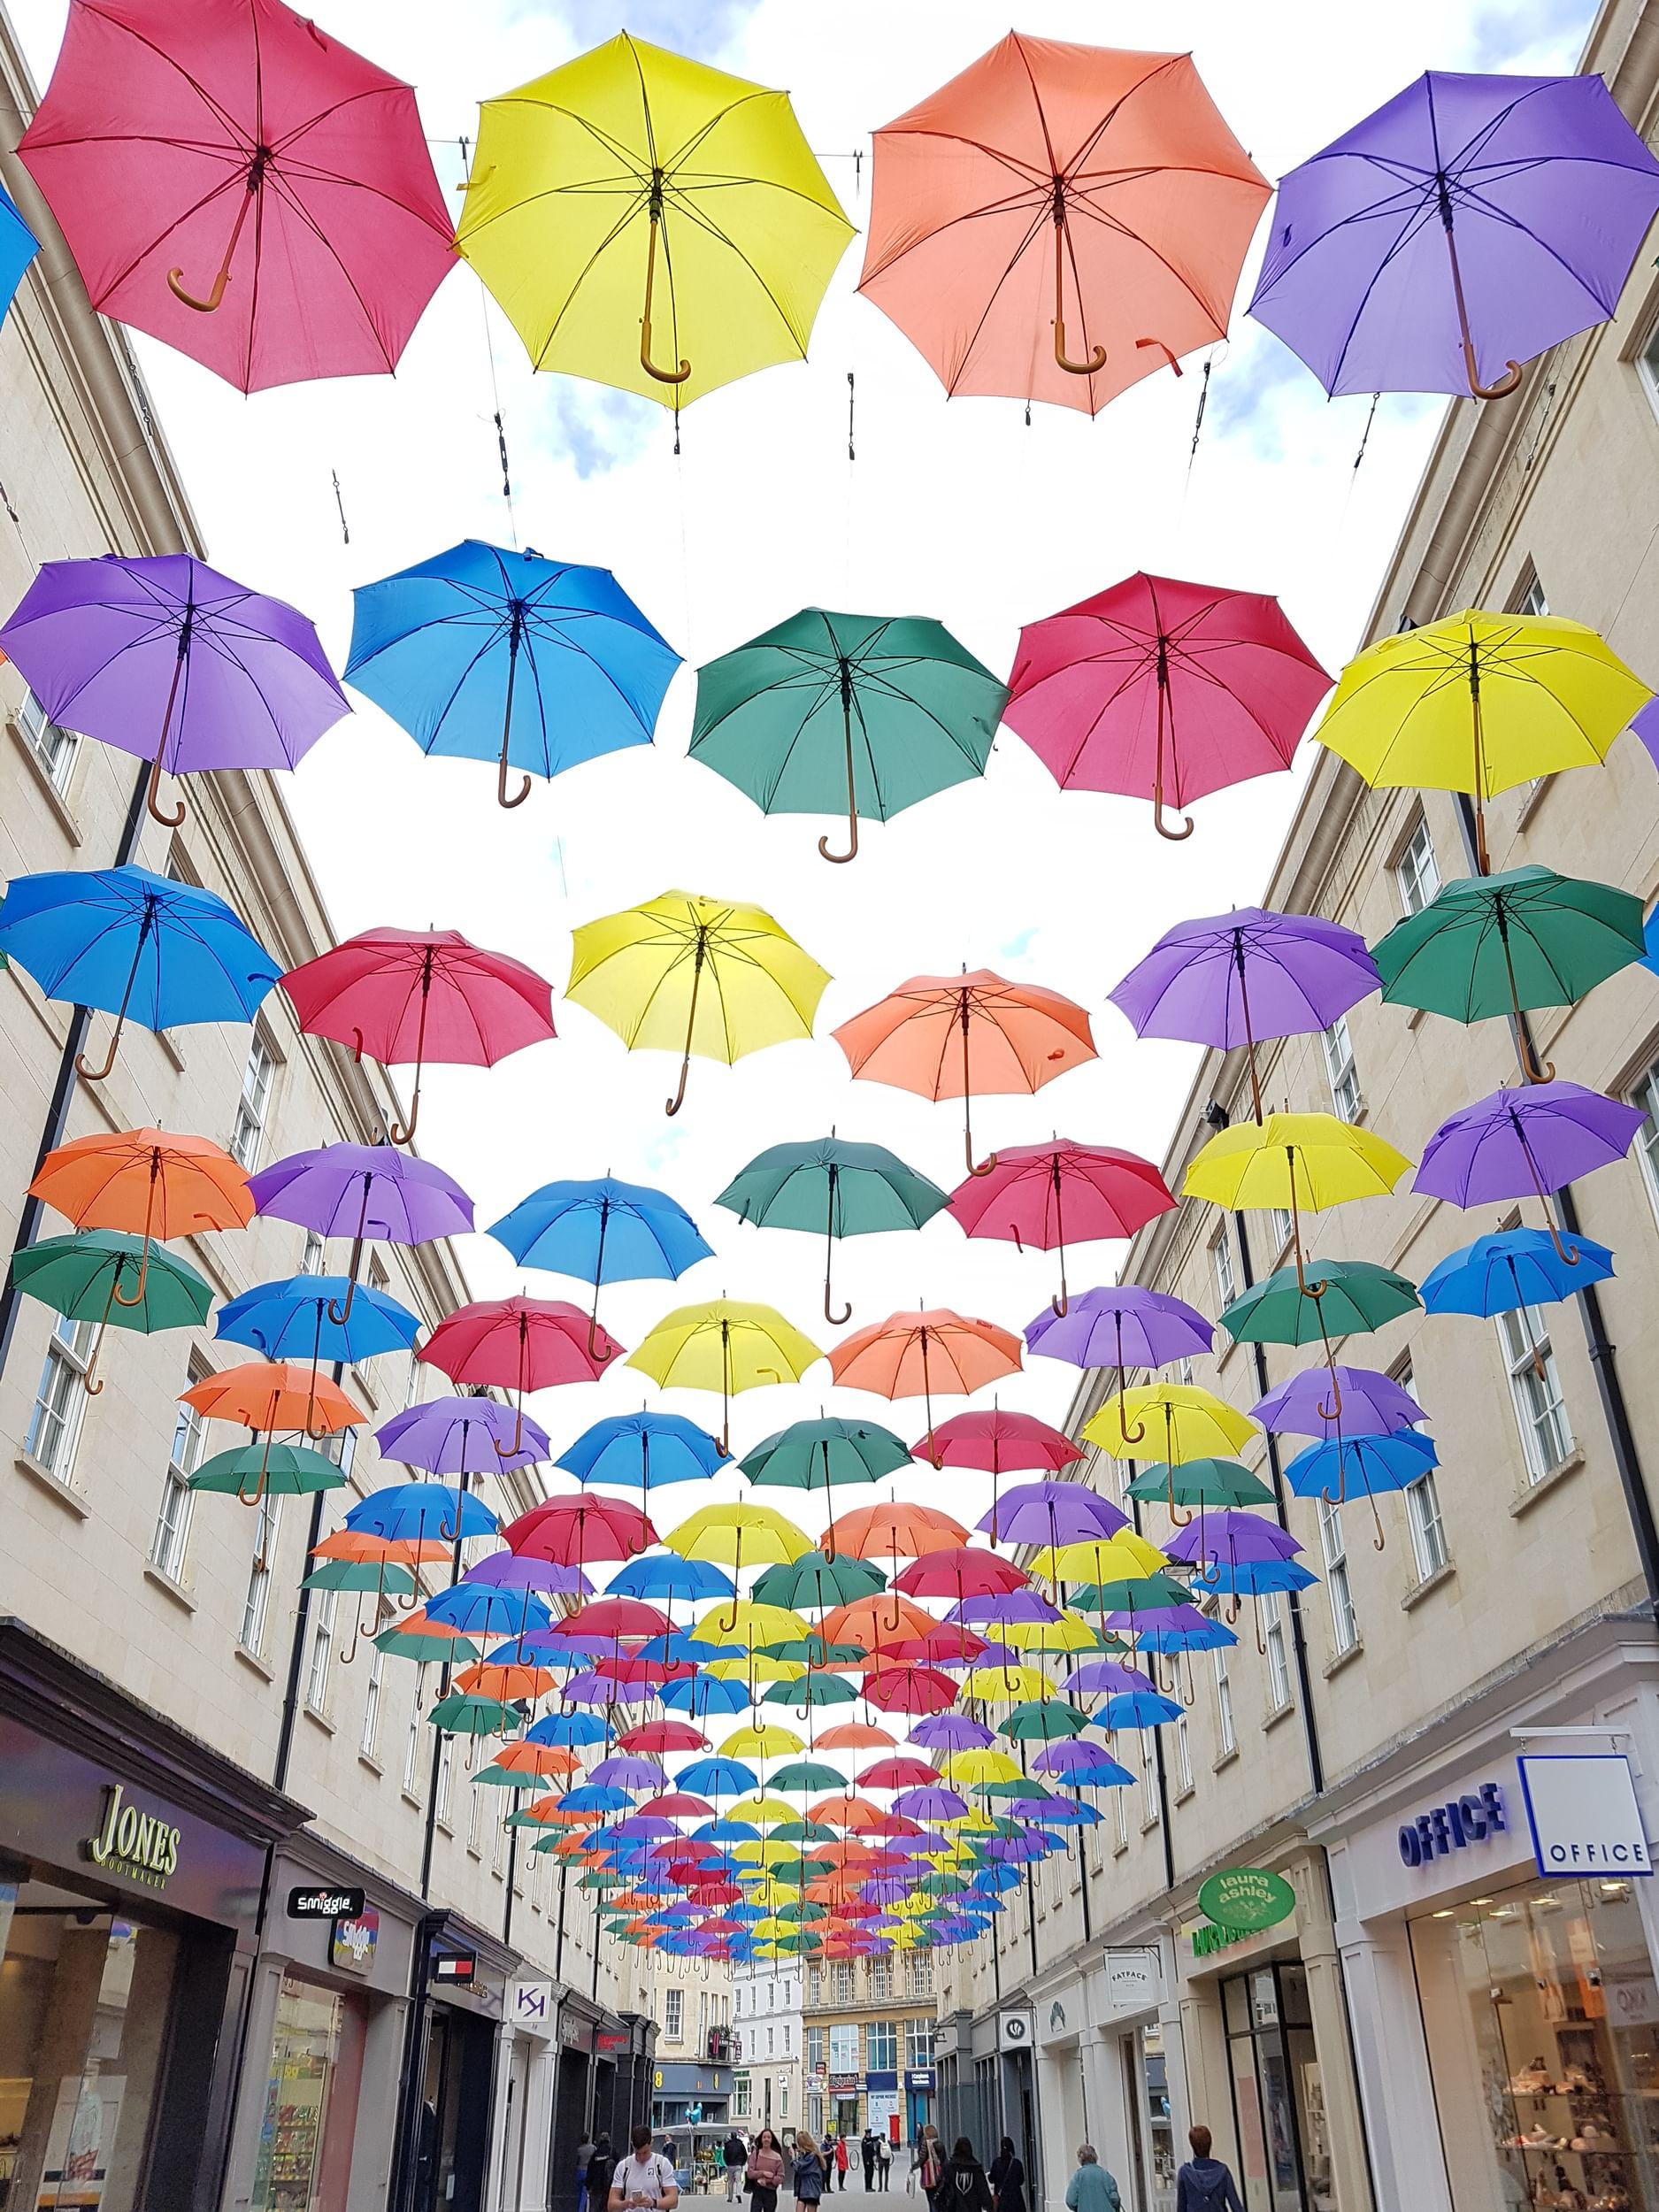 Umbrella artwork in Bath